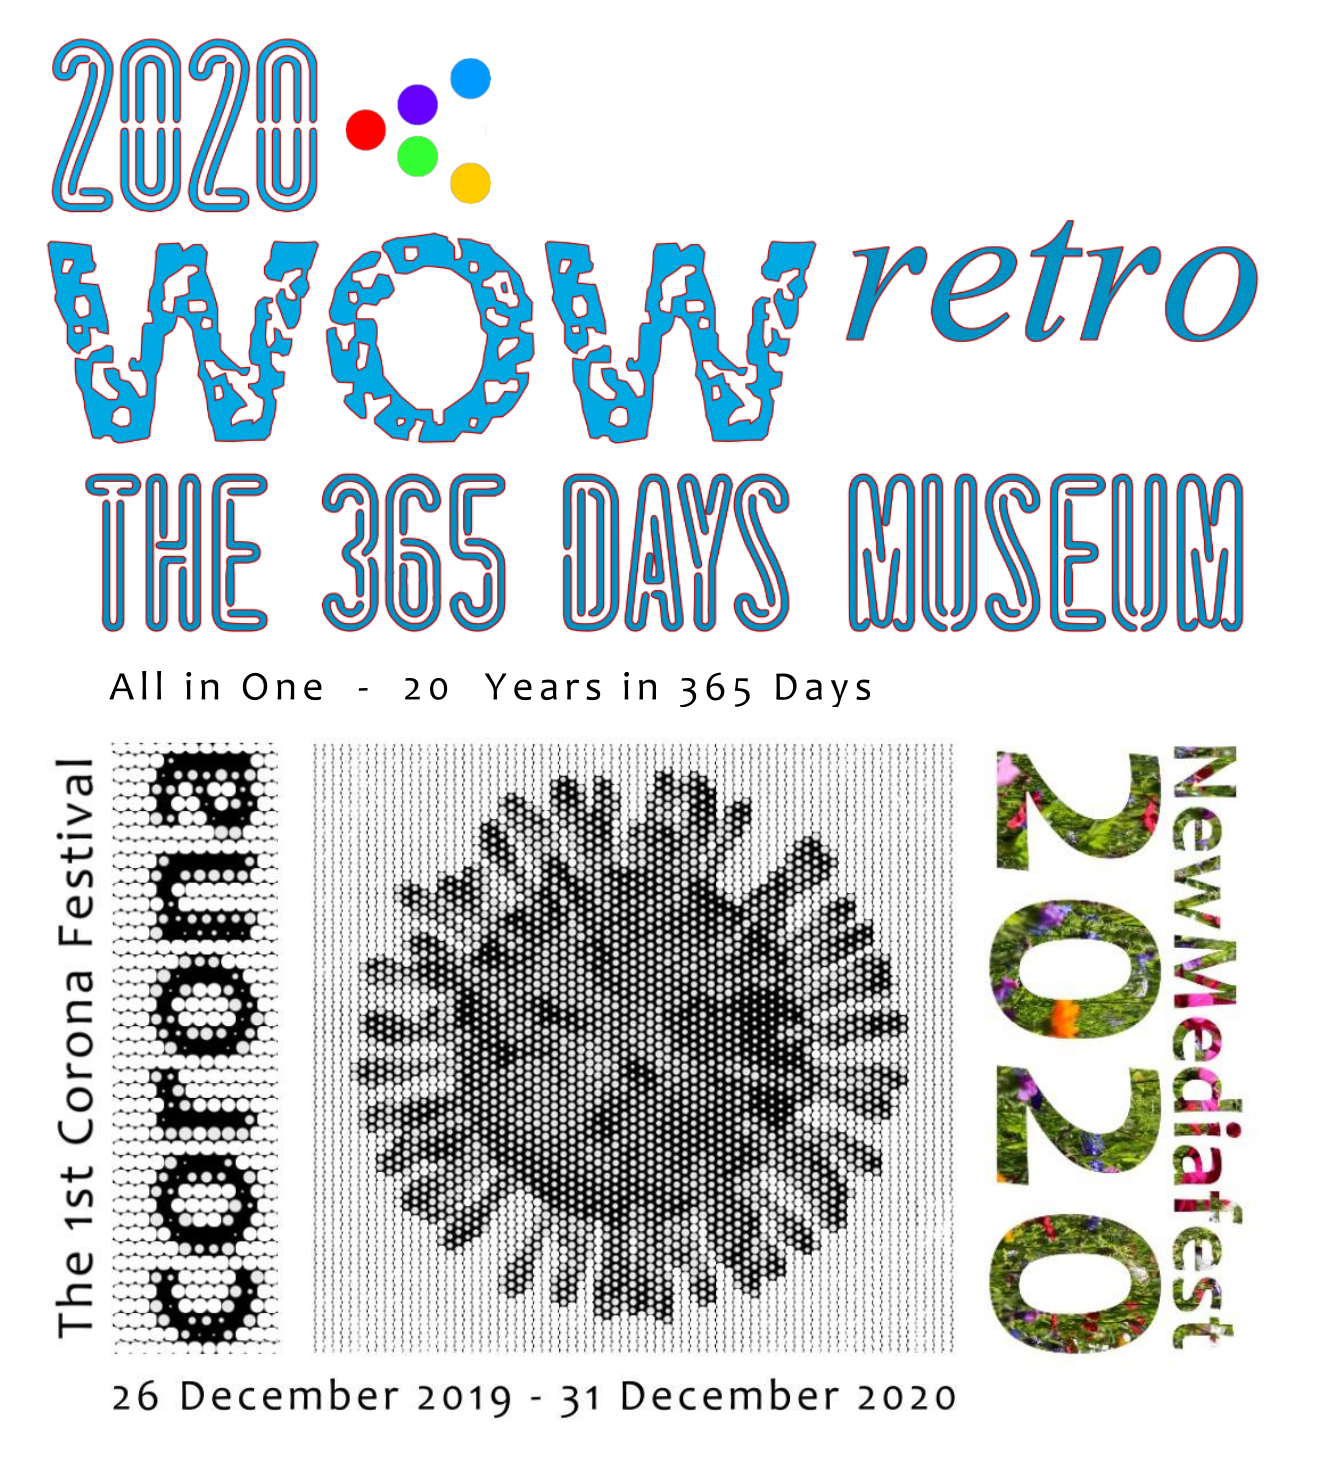 WOWretro - The 365 Days Museum